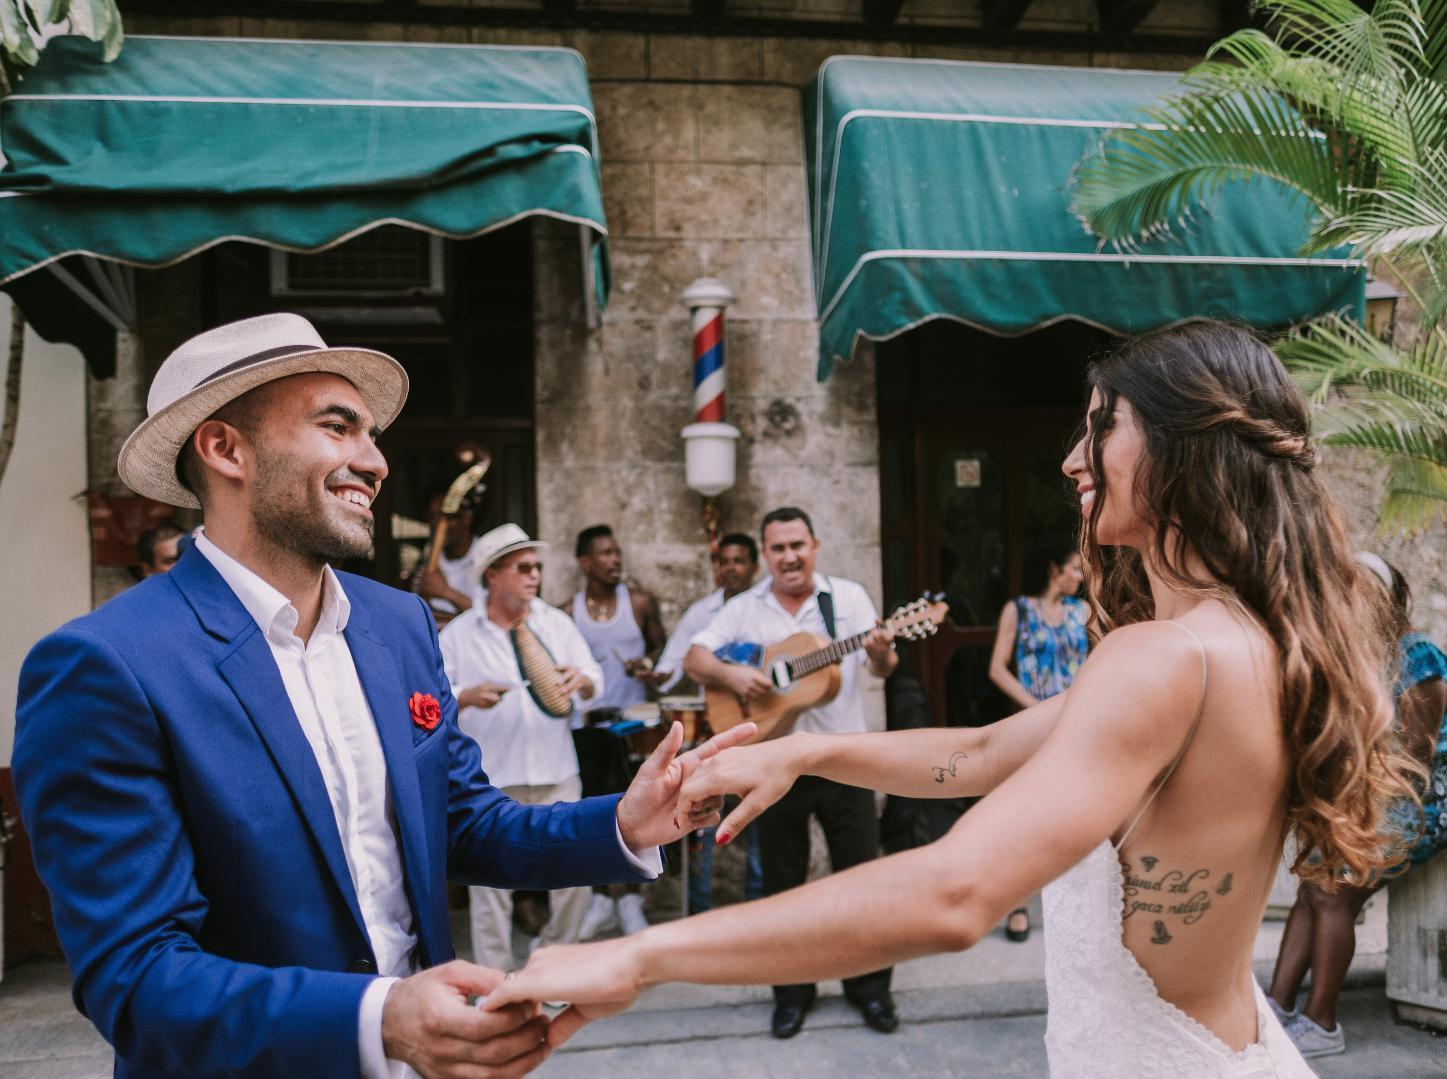 weddings-sin-clasificar-no-theme-cuba-28831.jpg